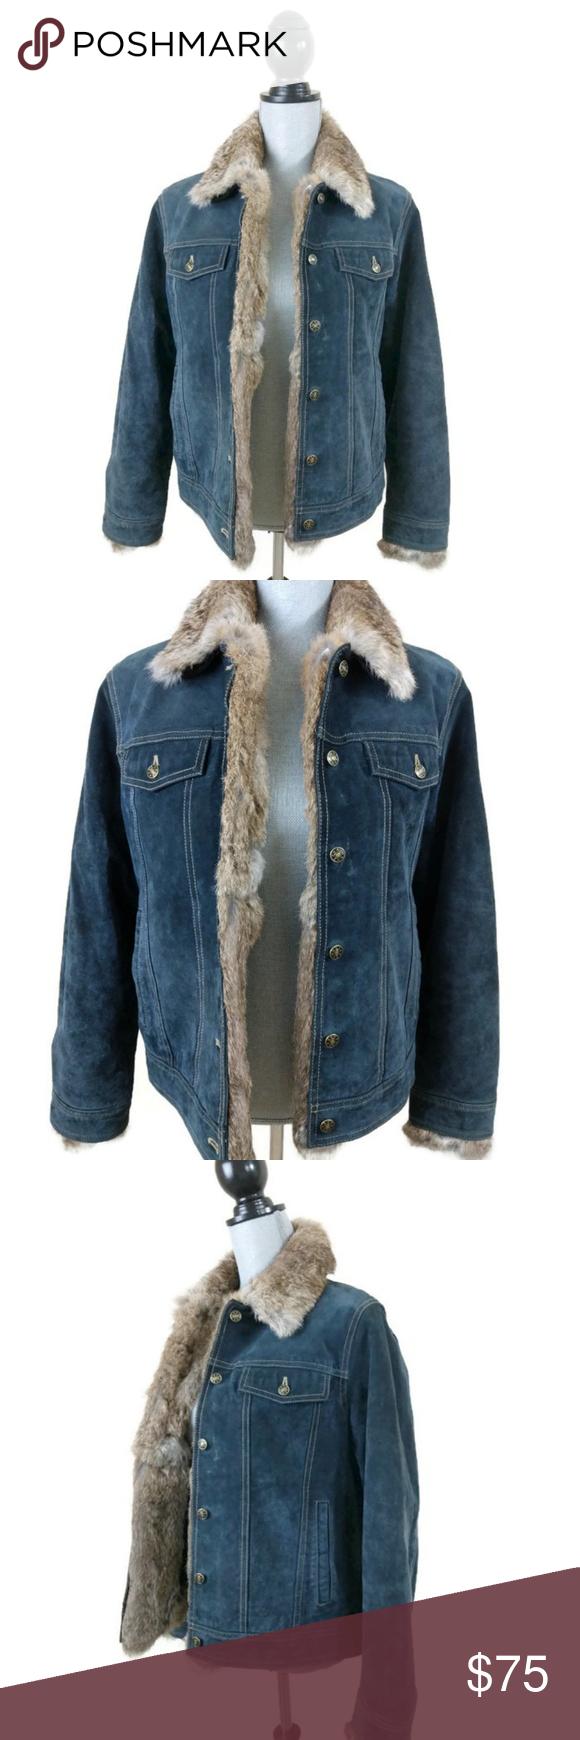 Wilson Leather Maxima Suede Jacket Rabbit Fur Trim